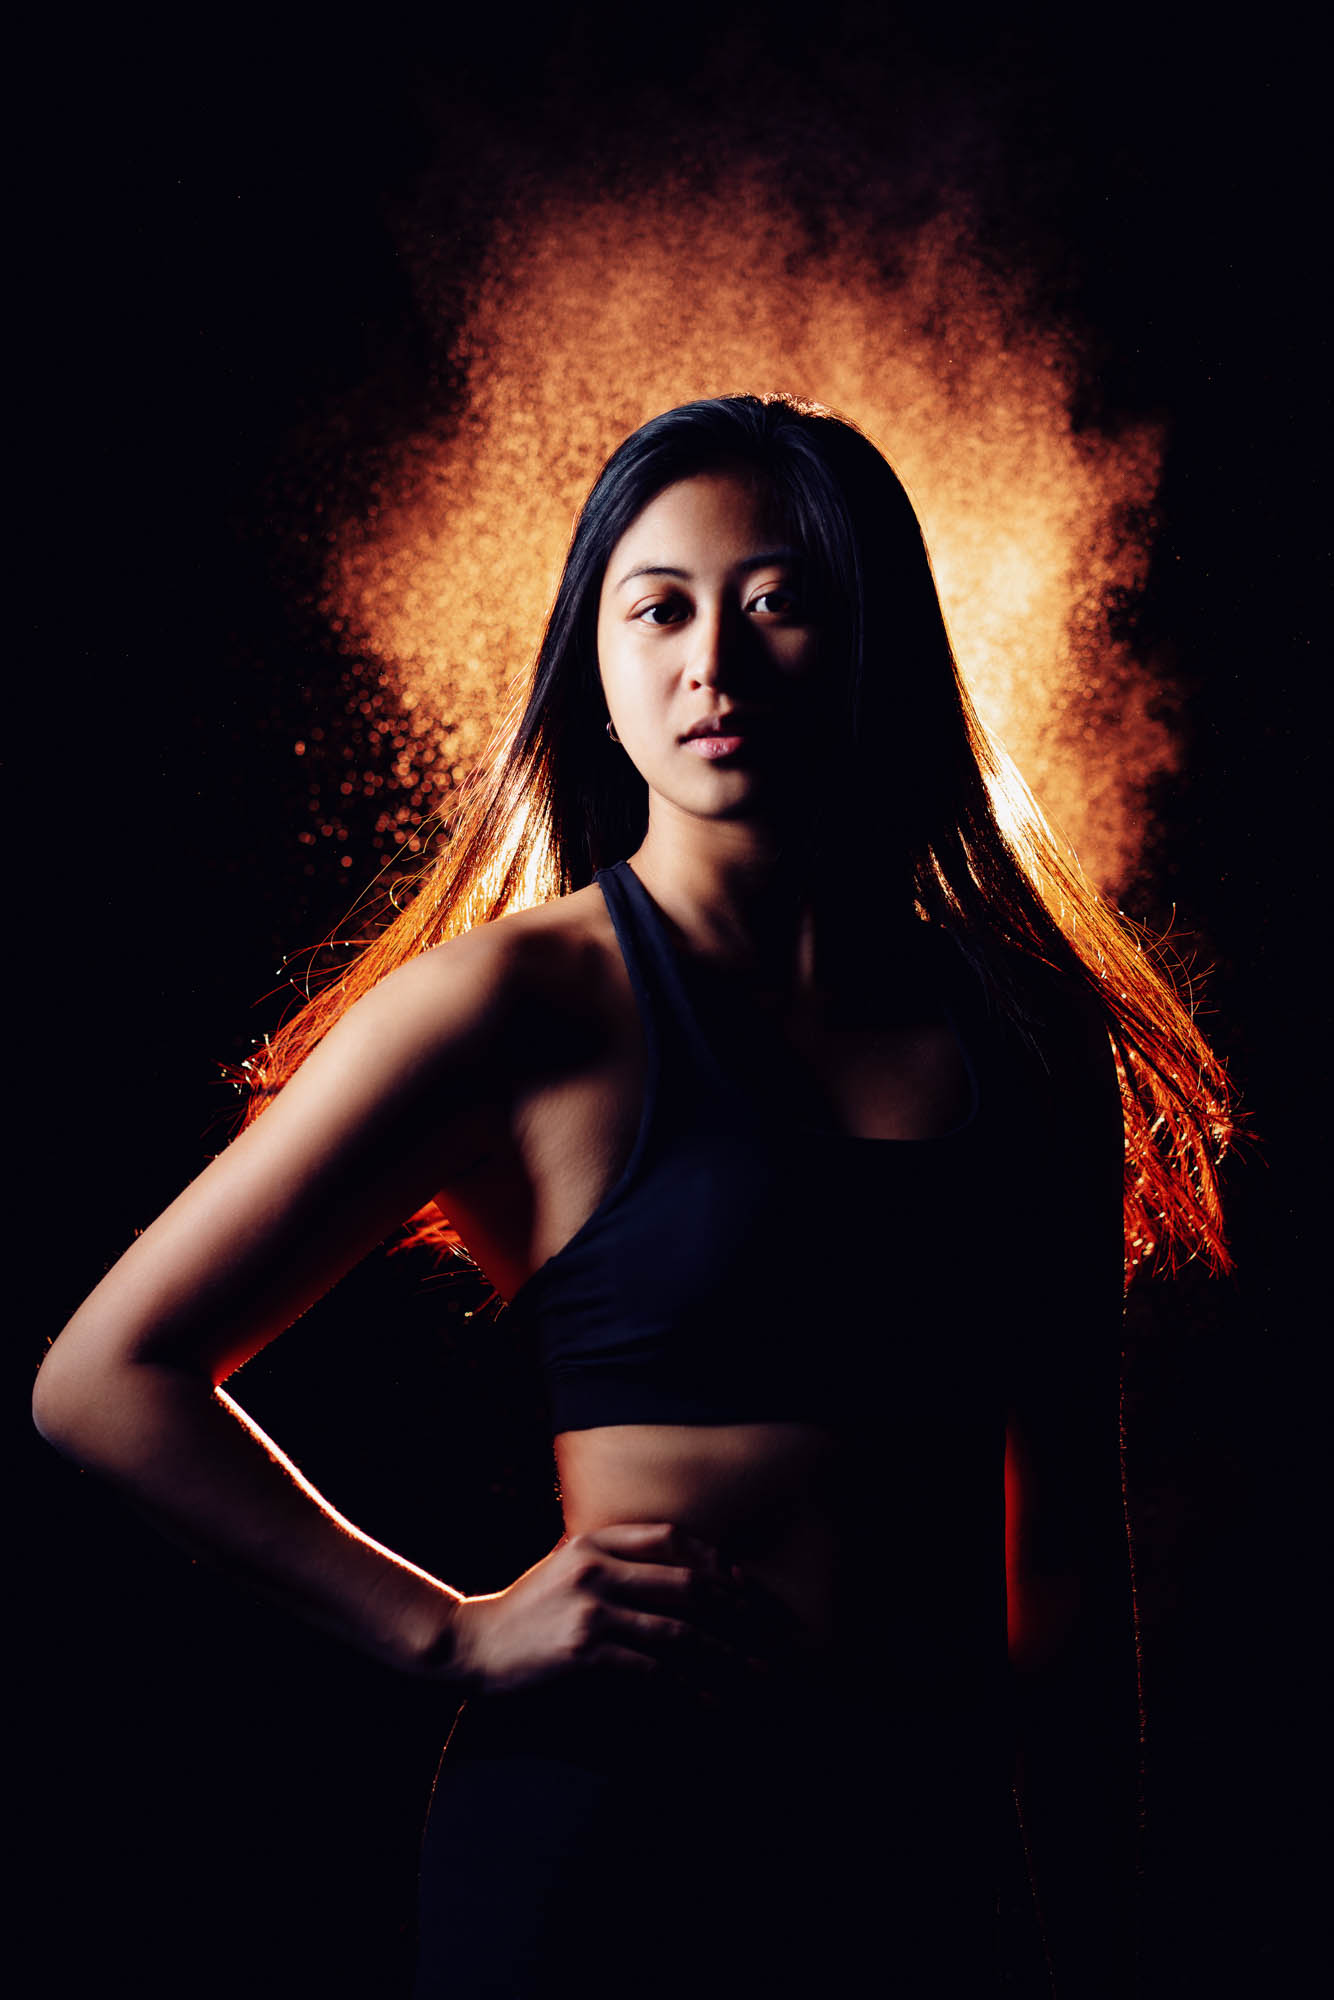 Lex & Josh Devy & Michelle Editorial Shoot Gymnastics Dance Light Trail Athlete-4.jpg